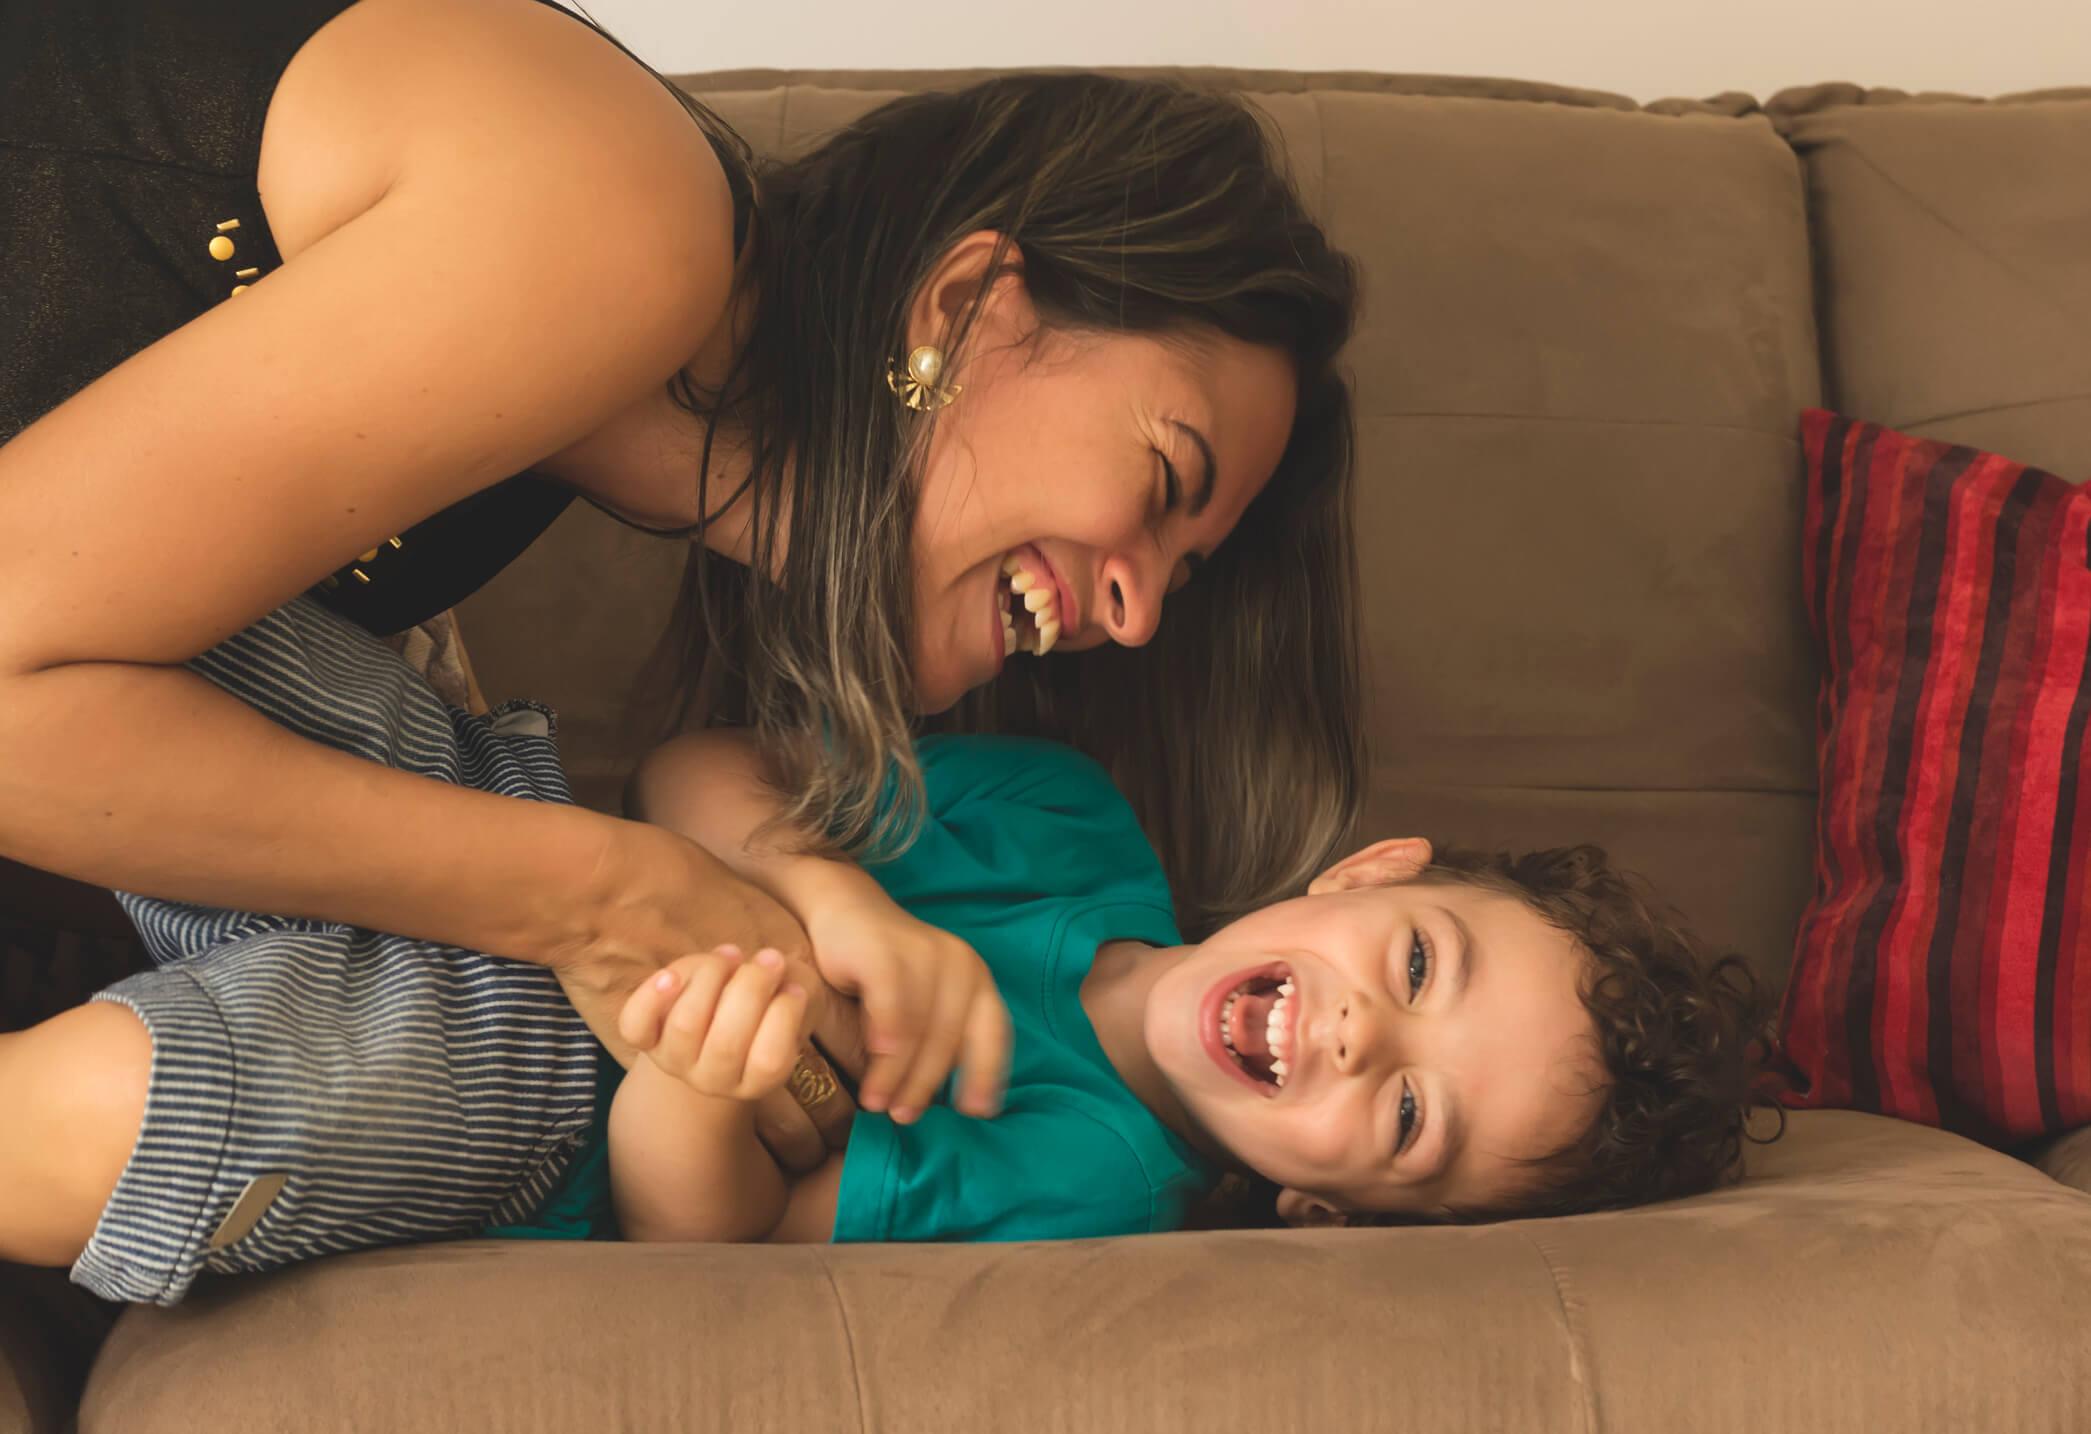 Anak Laki-laki Lebih Dekat Dengan Ibu, Ini Penjelasannya